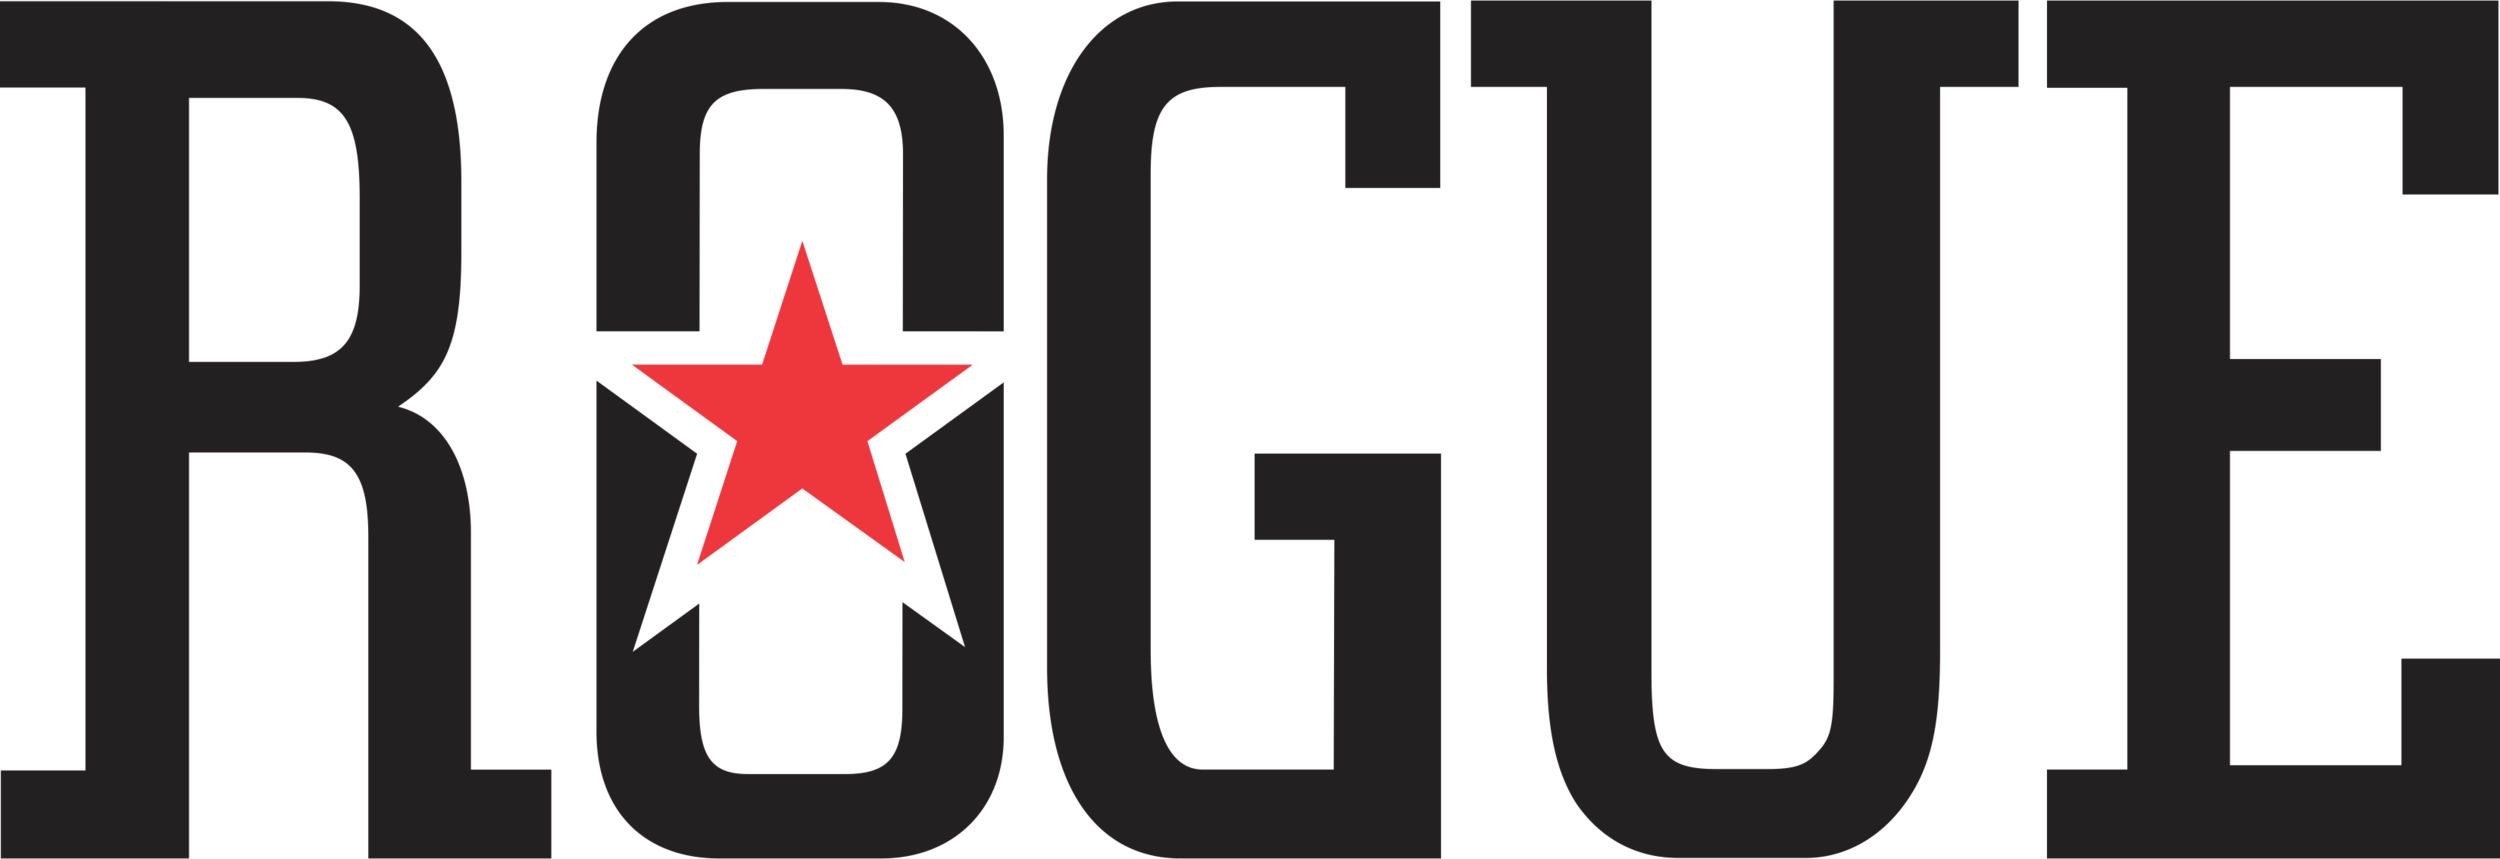 rogue+png.png